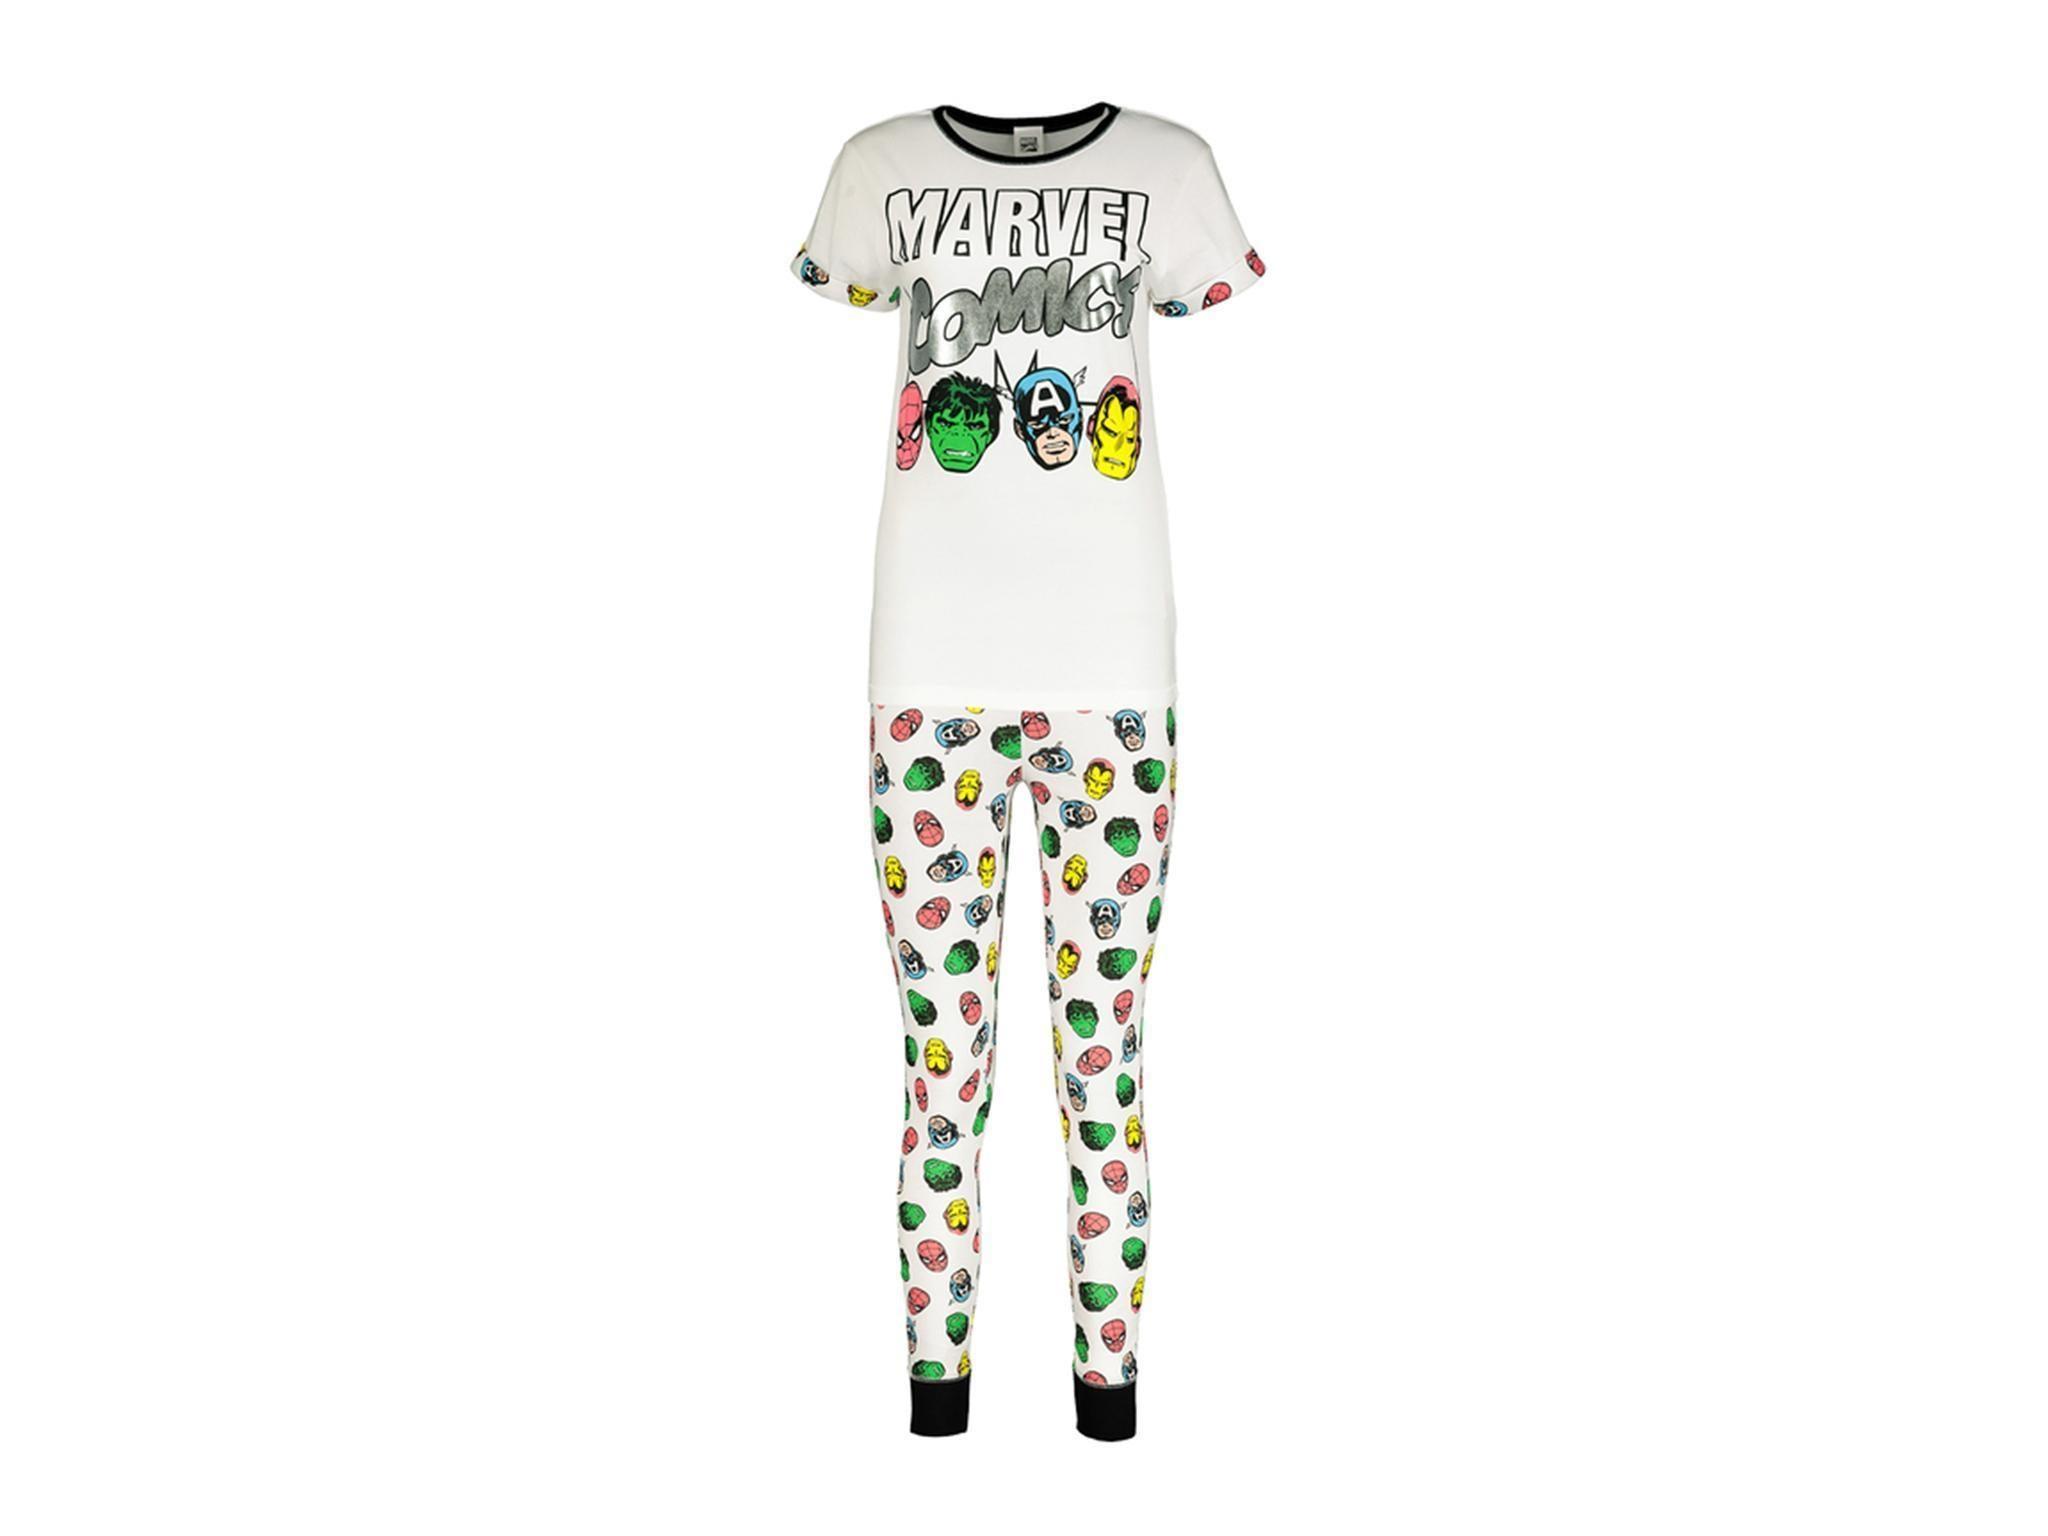 Killing Eve season 2: You can now buy Villanelle's pyjama fabric